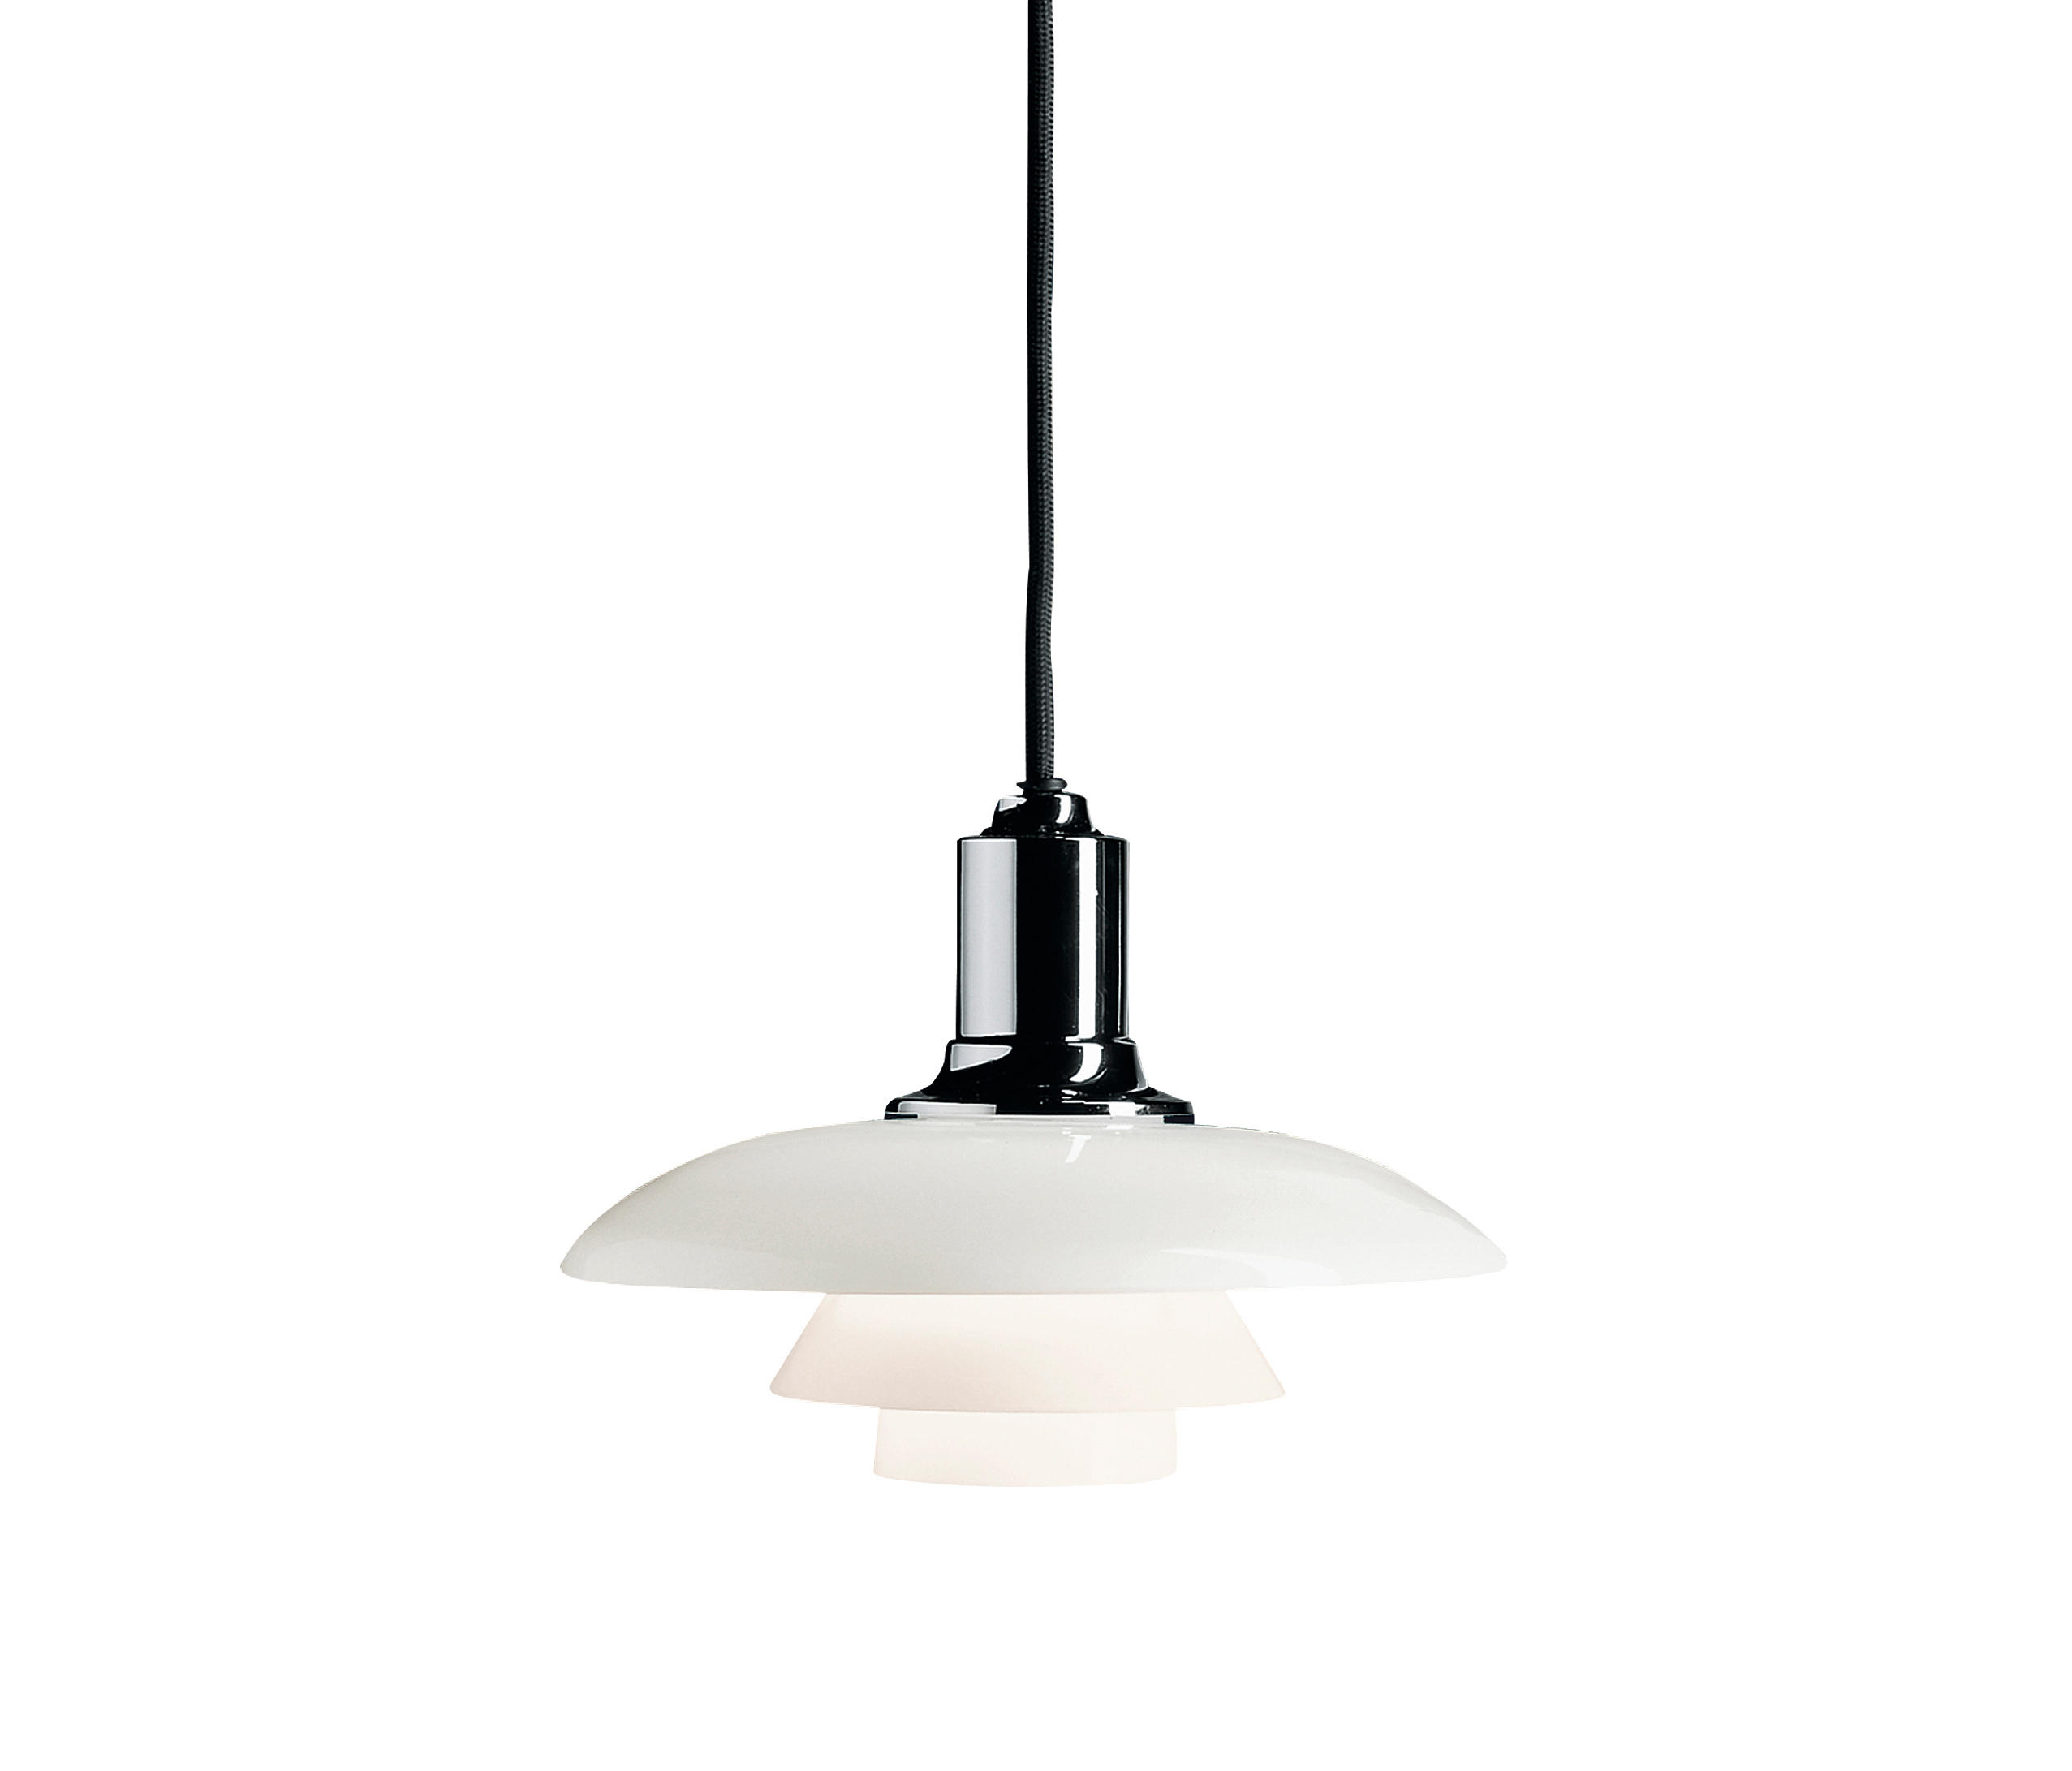 PH 2/1 Pendant by Louis Poulsen | Suspended lights  sc 1 st  Architonic & PH 2/1 PENDANT - Suspended lights from Louis Poulsen | Architonic